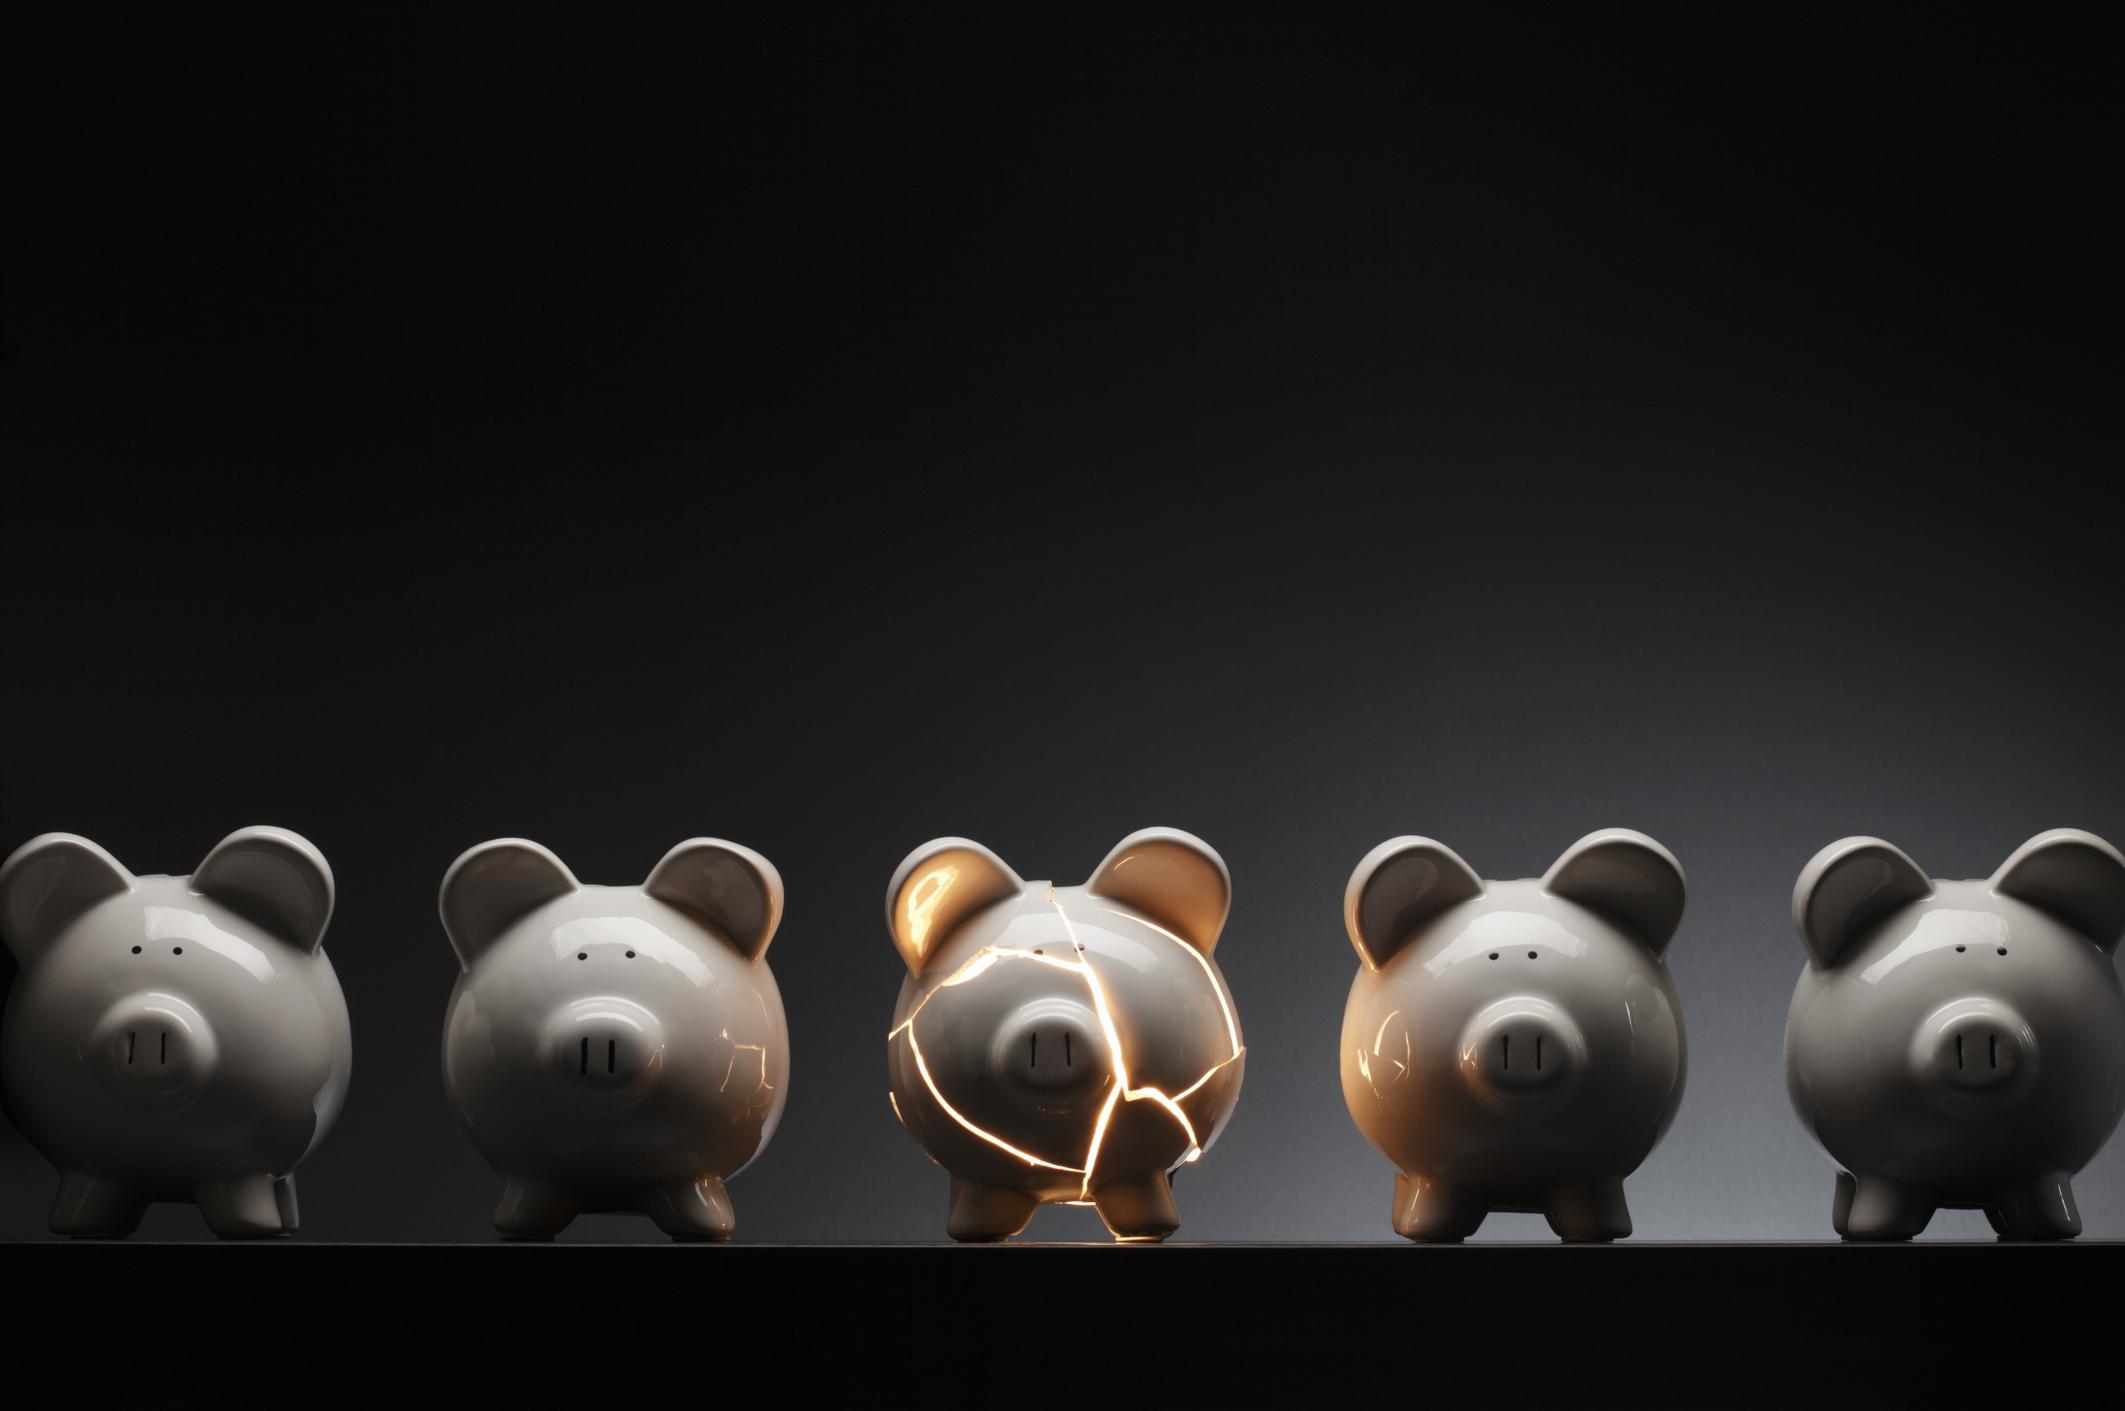 Cracked piggy bank